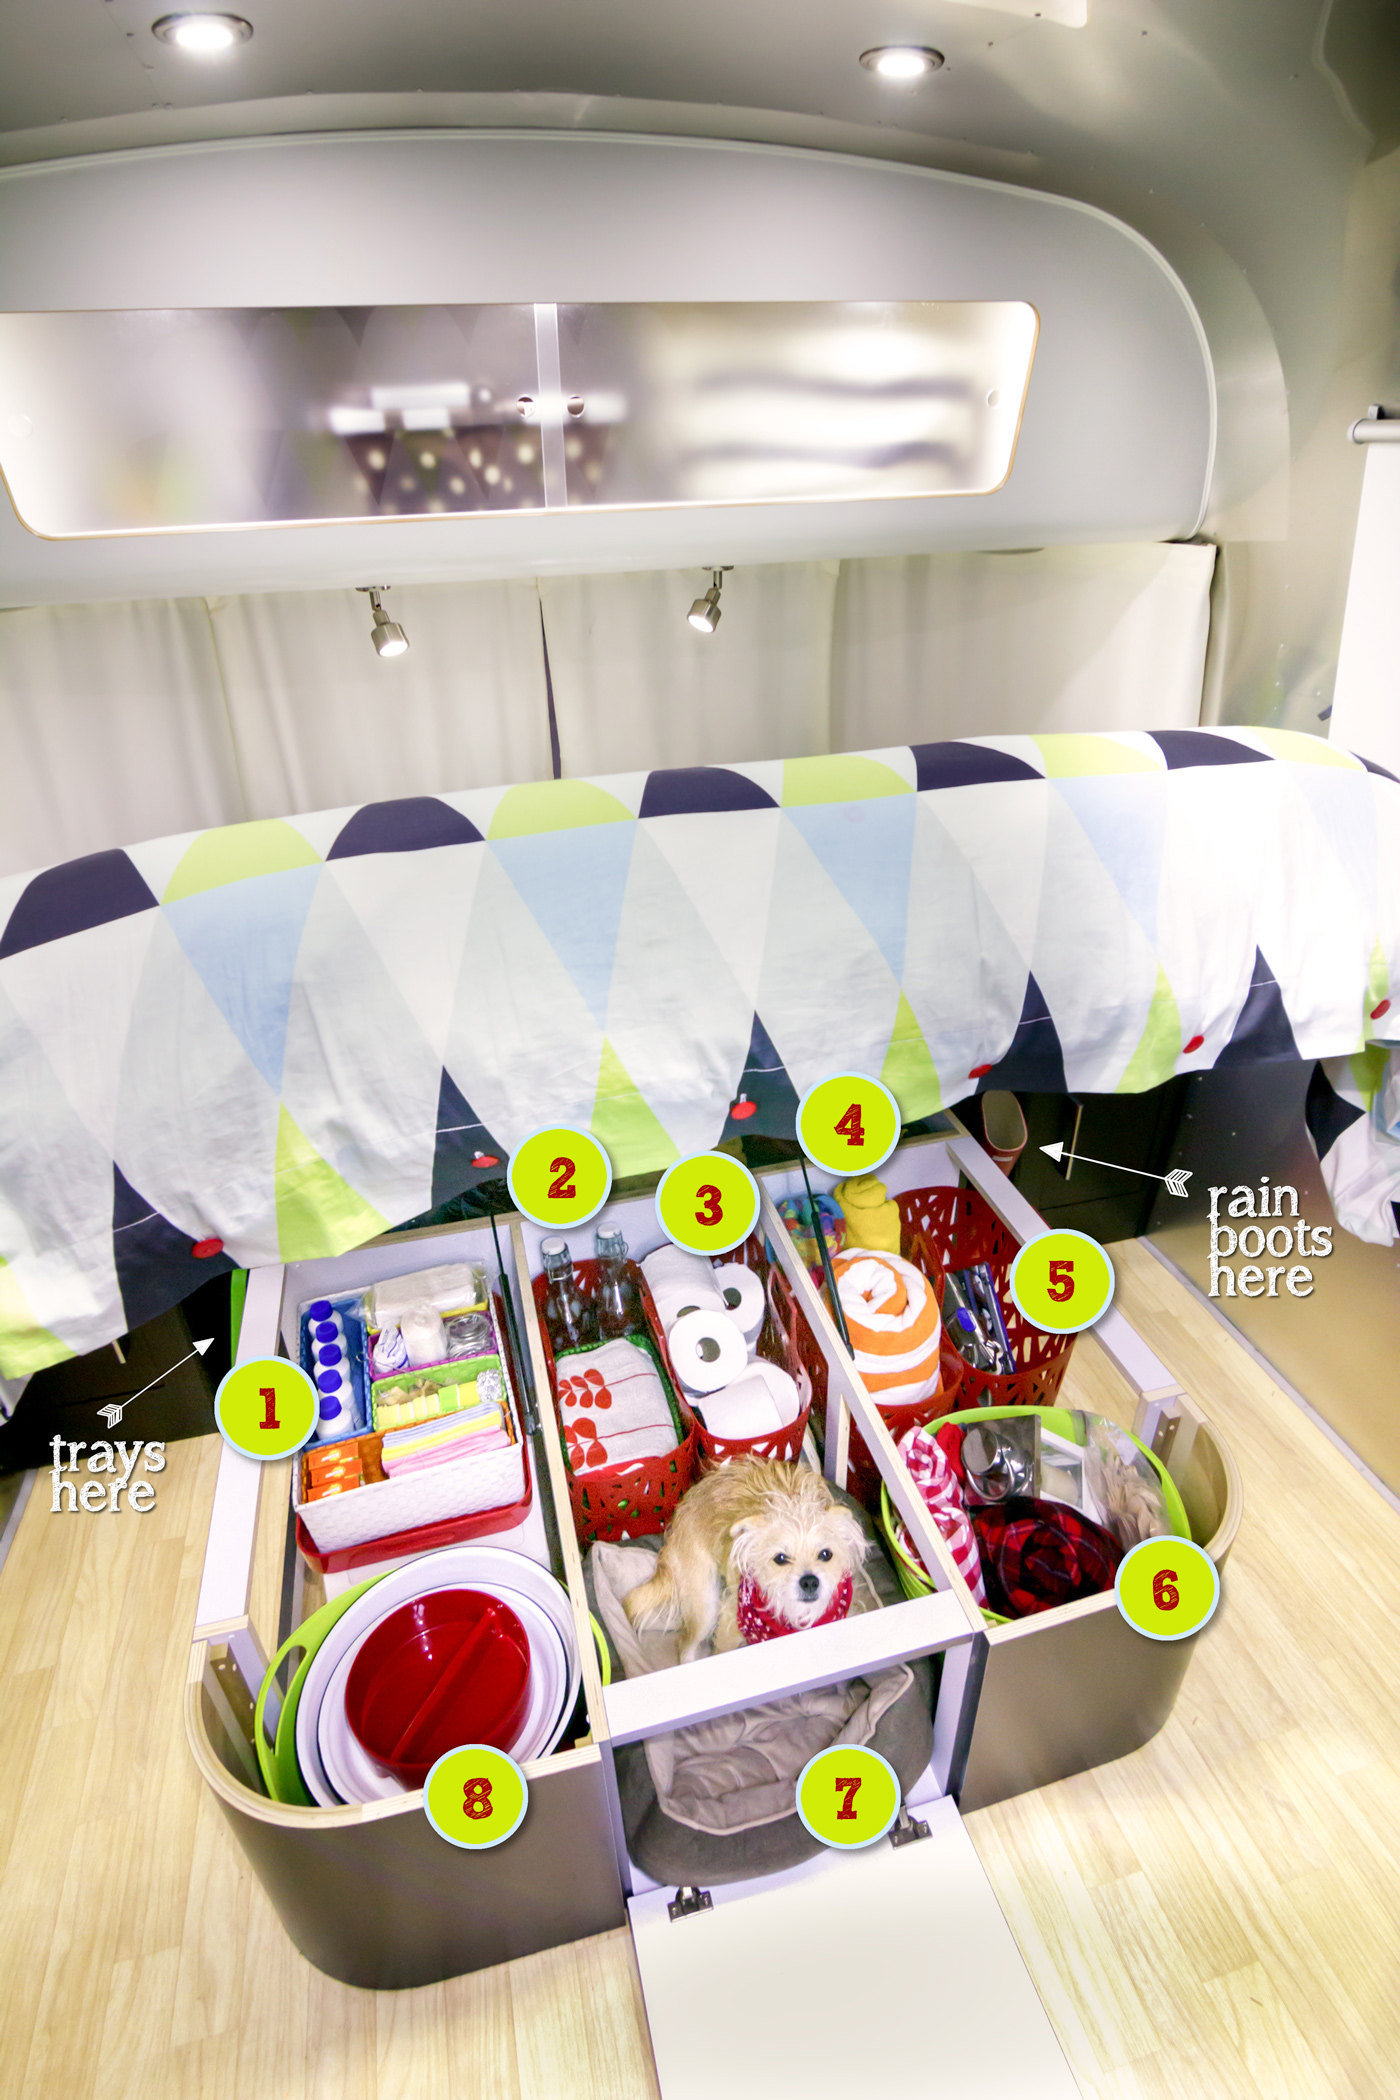 Under Bed Storage Organization on the Airstream  via J5MM.com // RV Lifestyle #Airstream Style